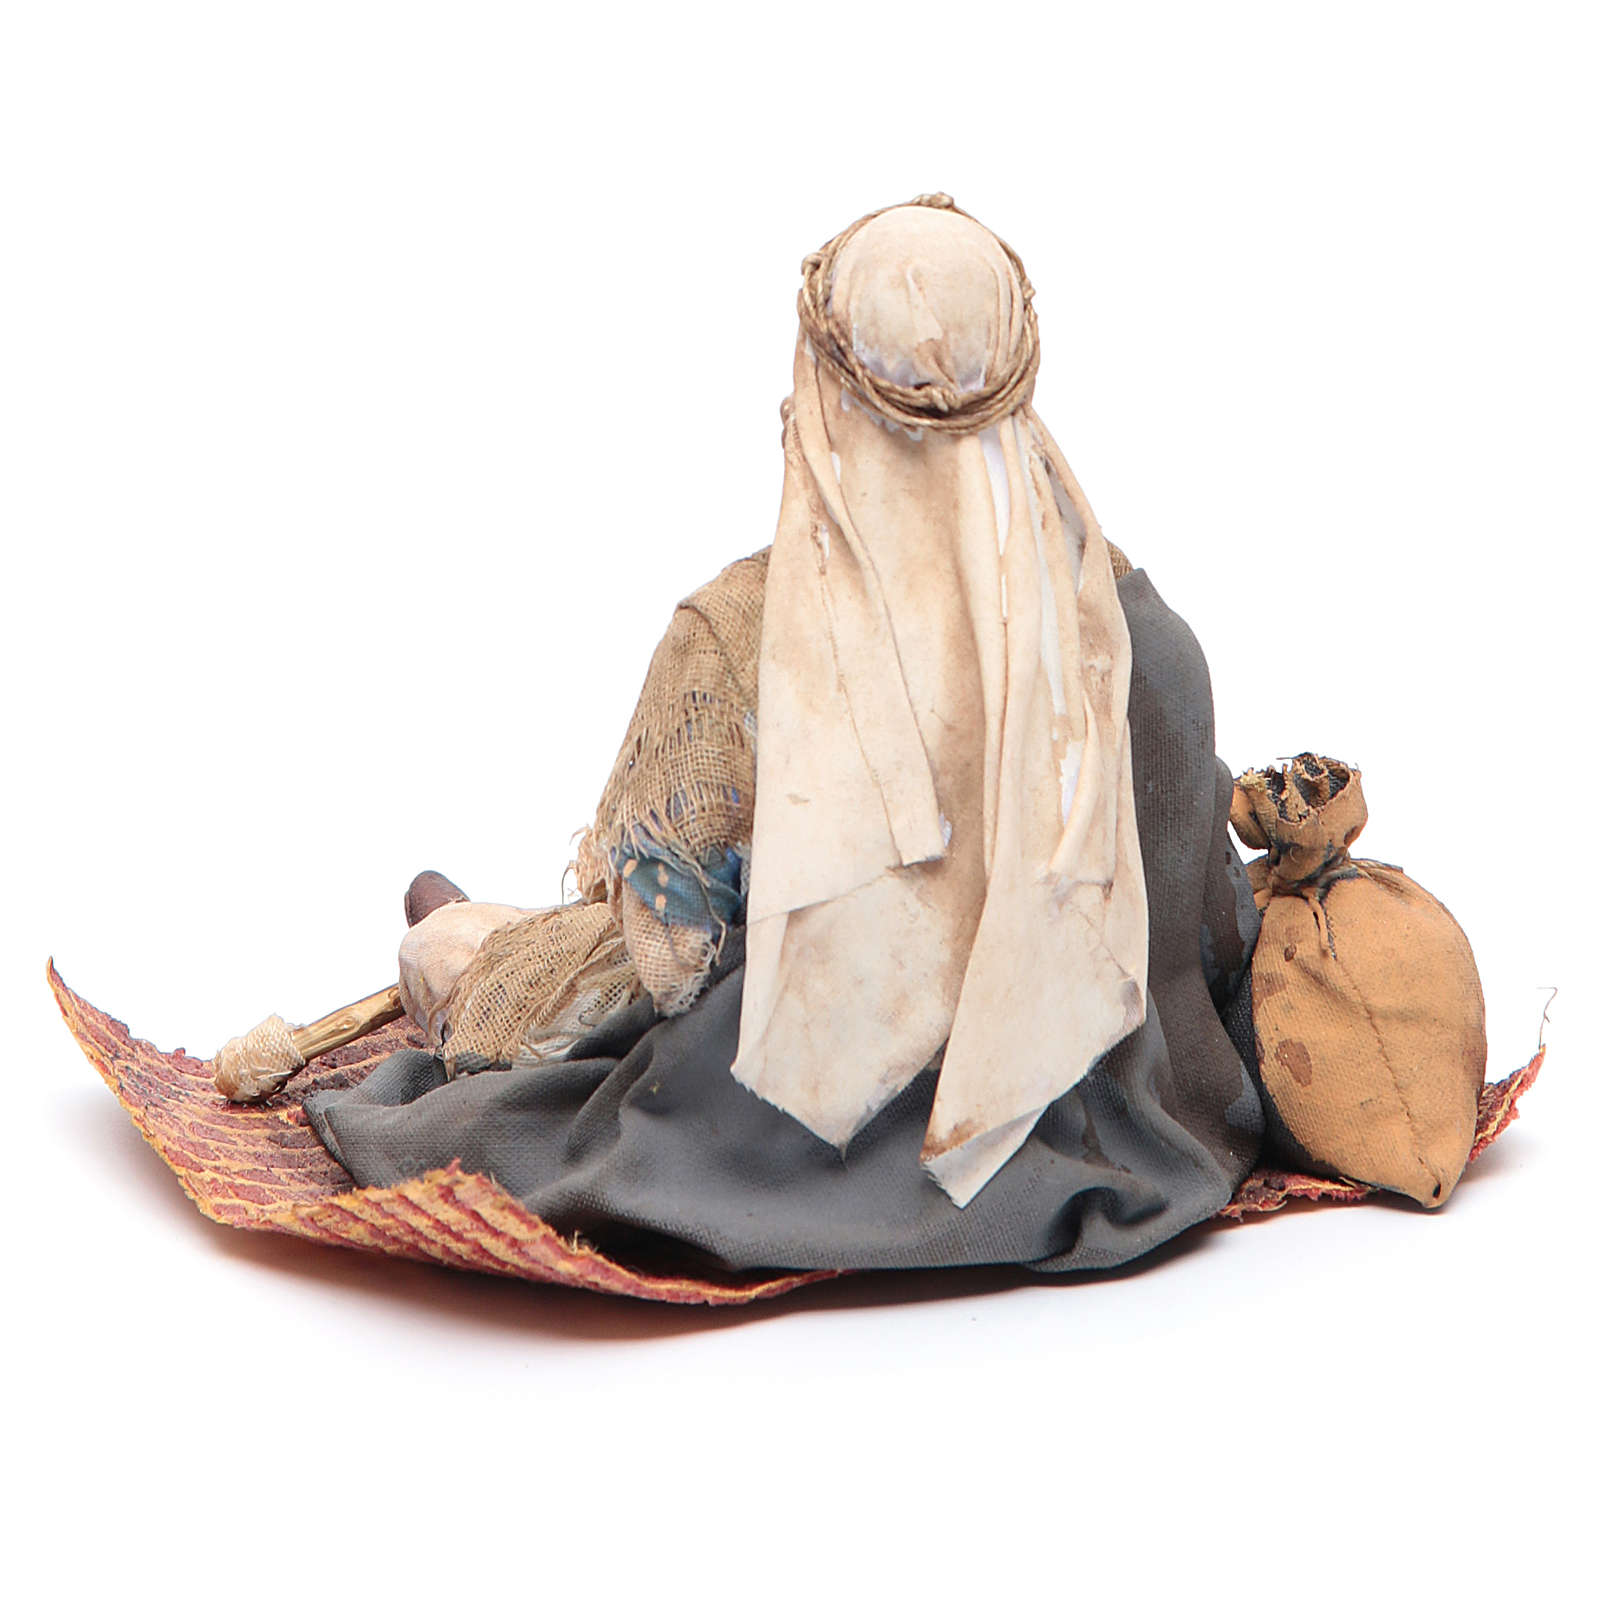 Mendicante storpio seduto 18 cm Angela Tripi 4